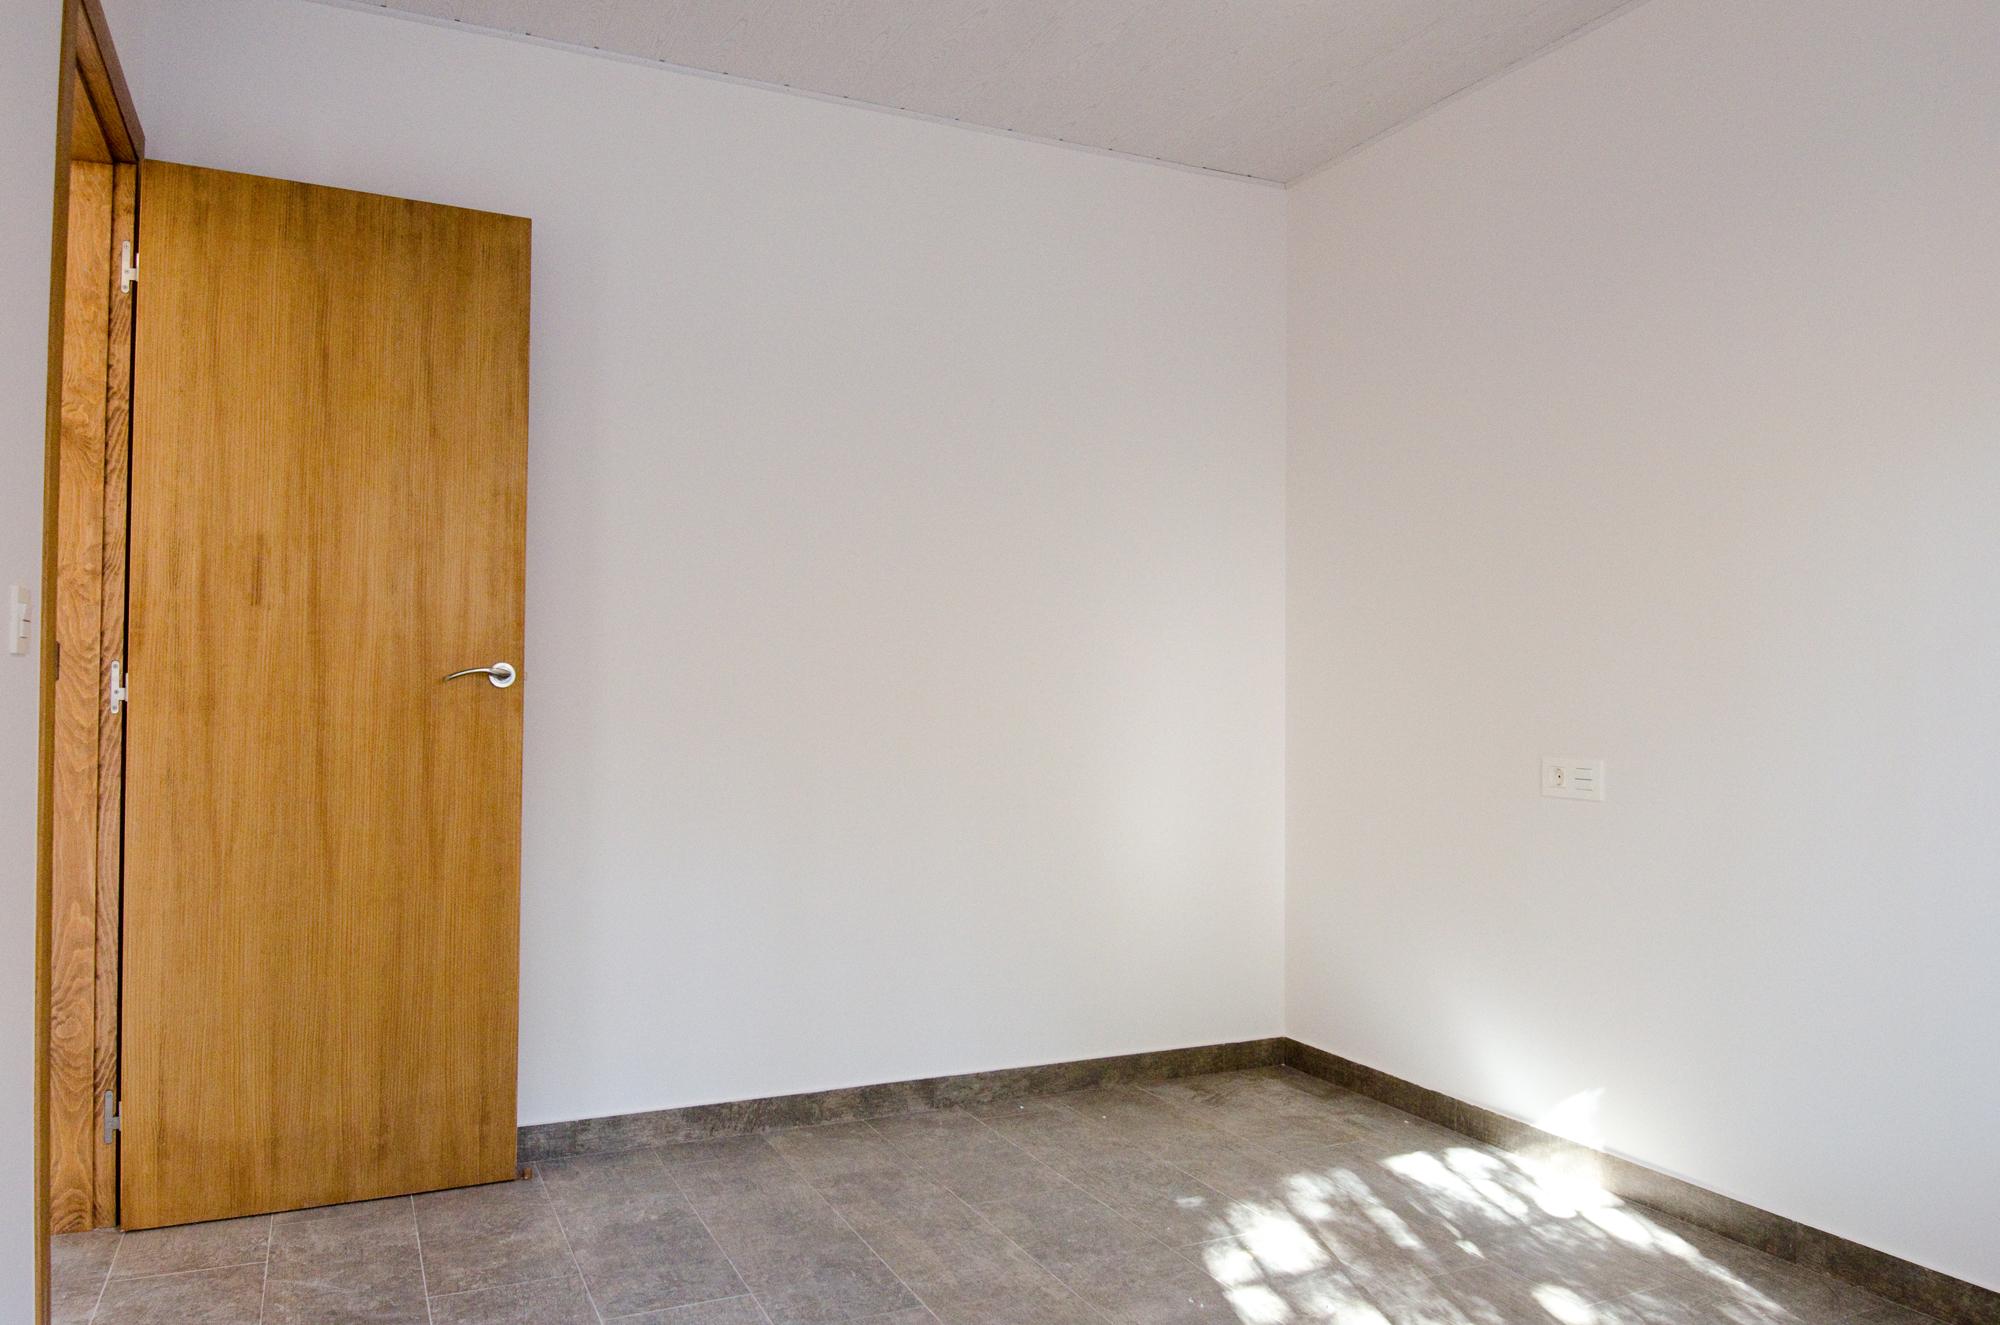 casa de madera interior4